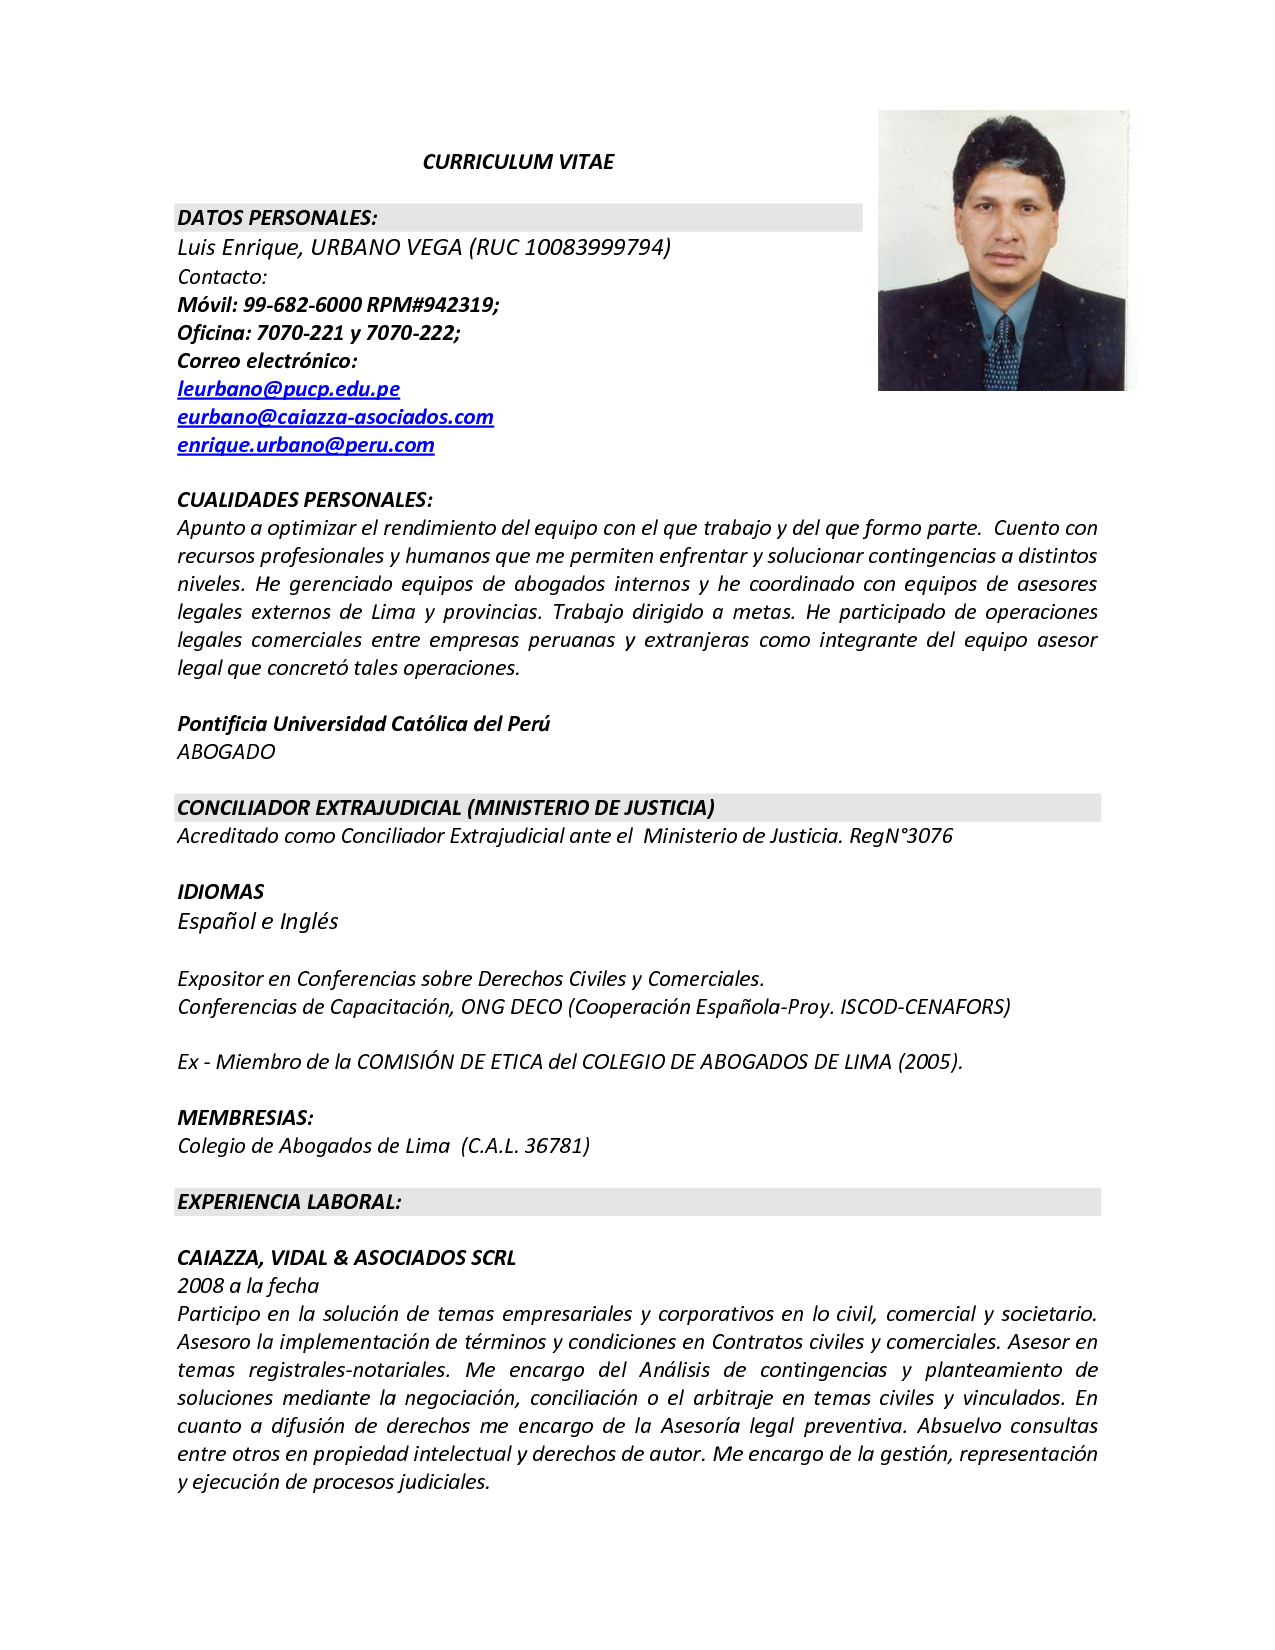 Modelo curriculum vitae para trabajo contabilidad - professional ...